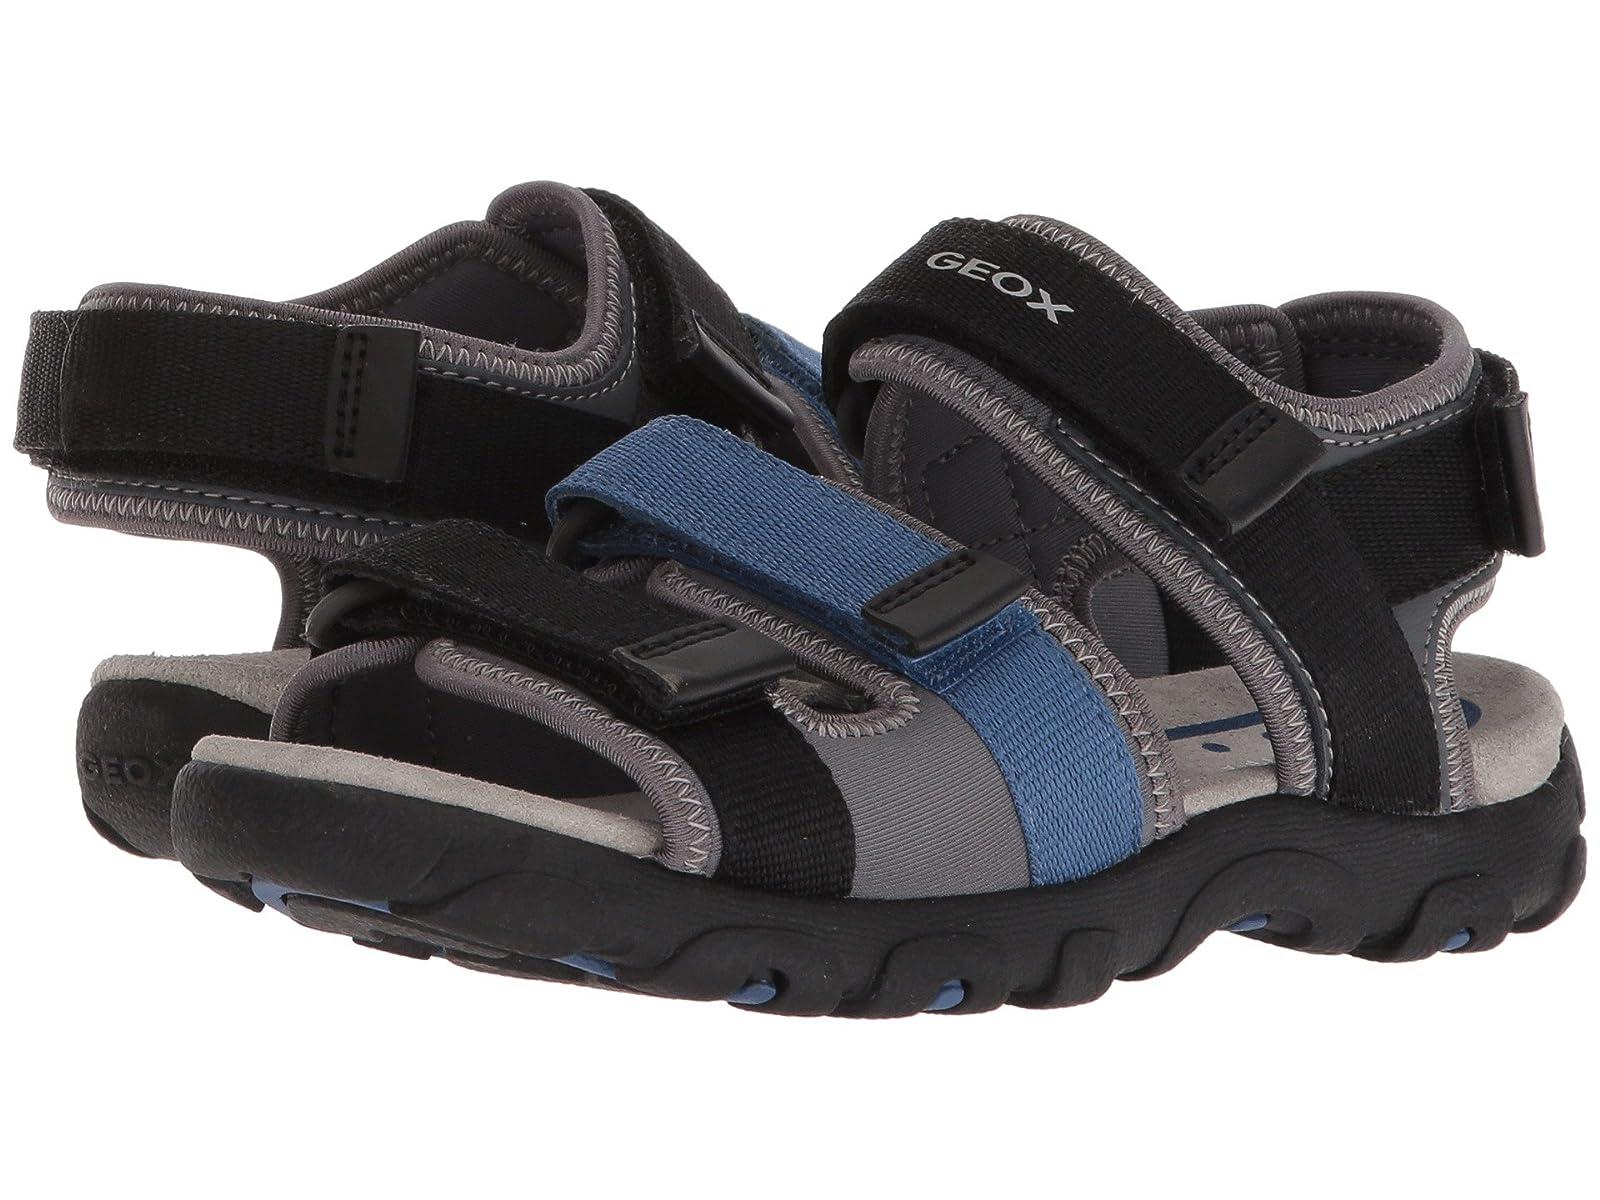 Geox Kids Strada 15 (Little Kid/Big Kid)Atmospheric grades have affordable shoes